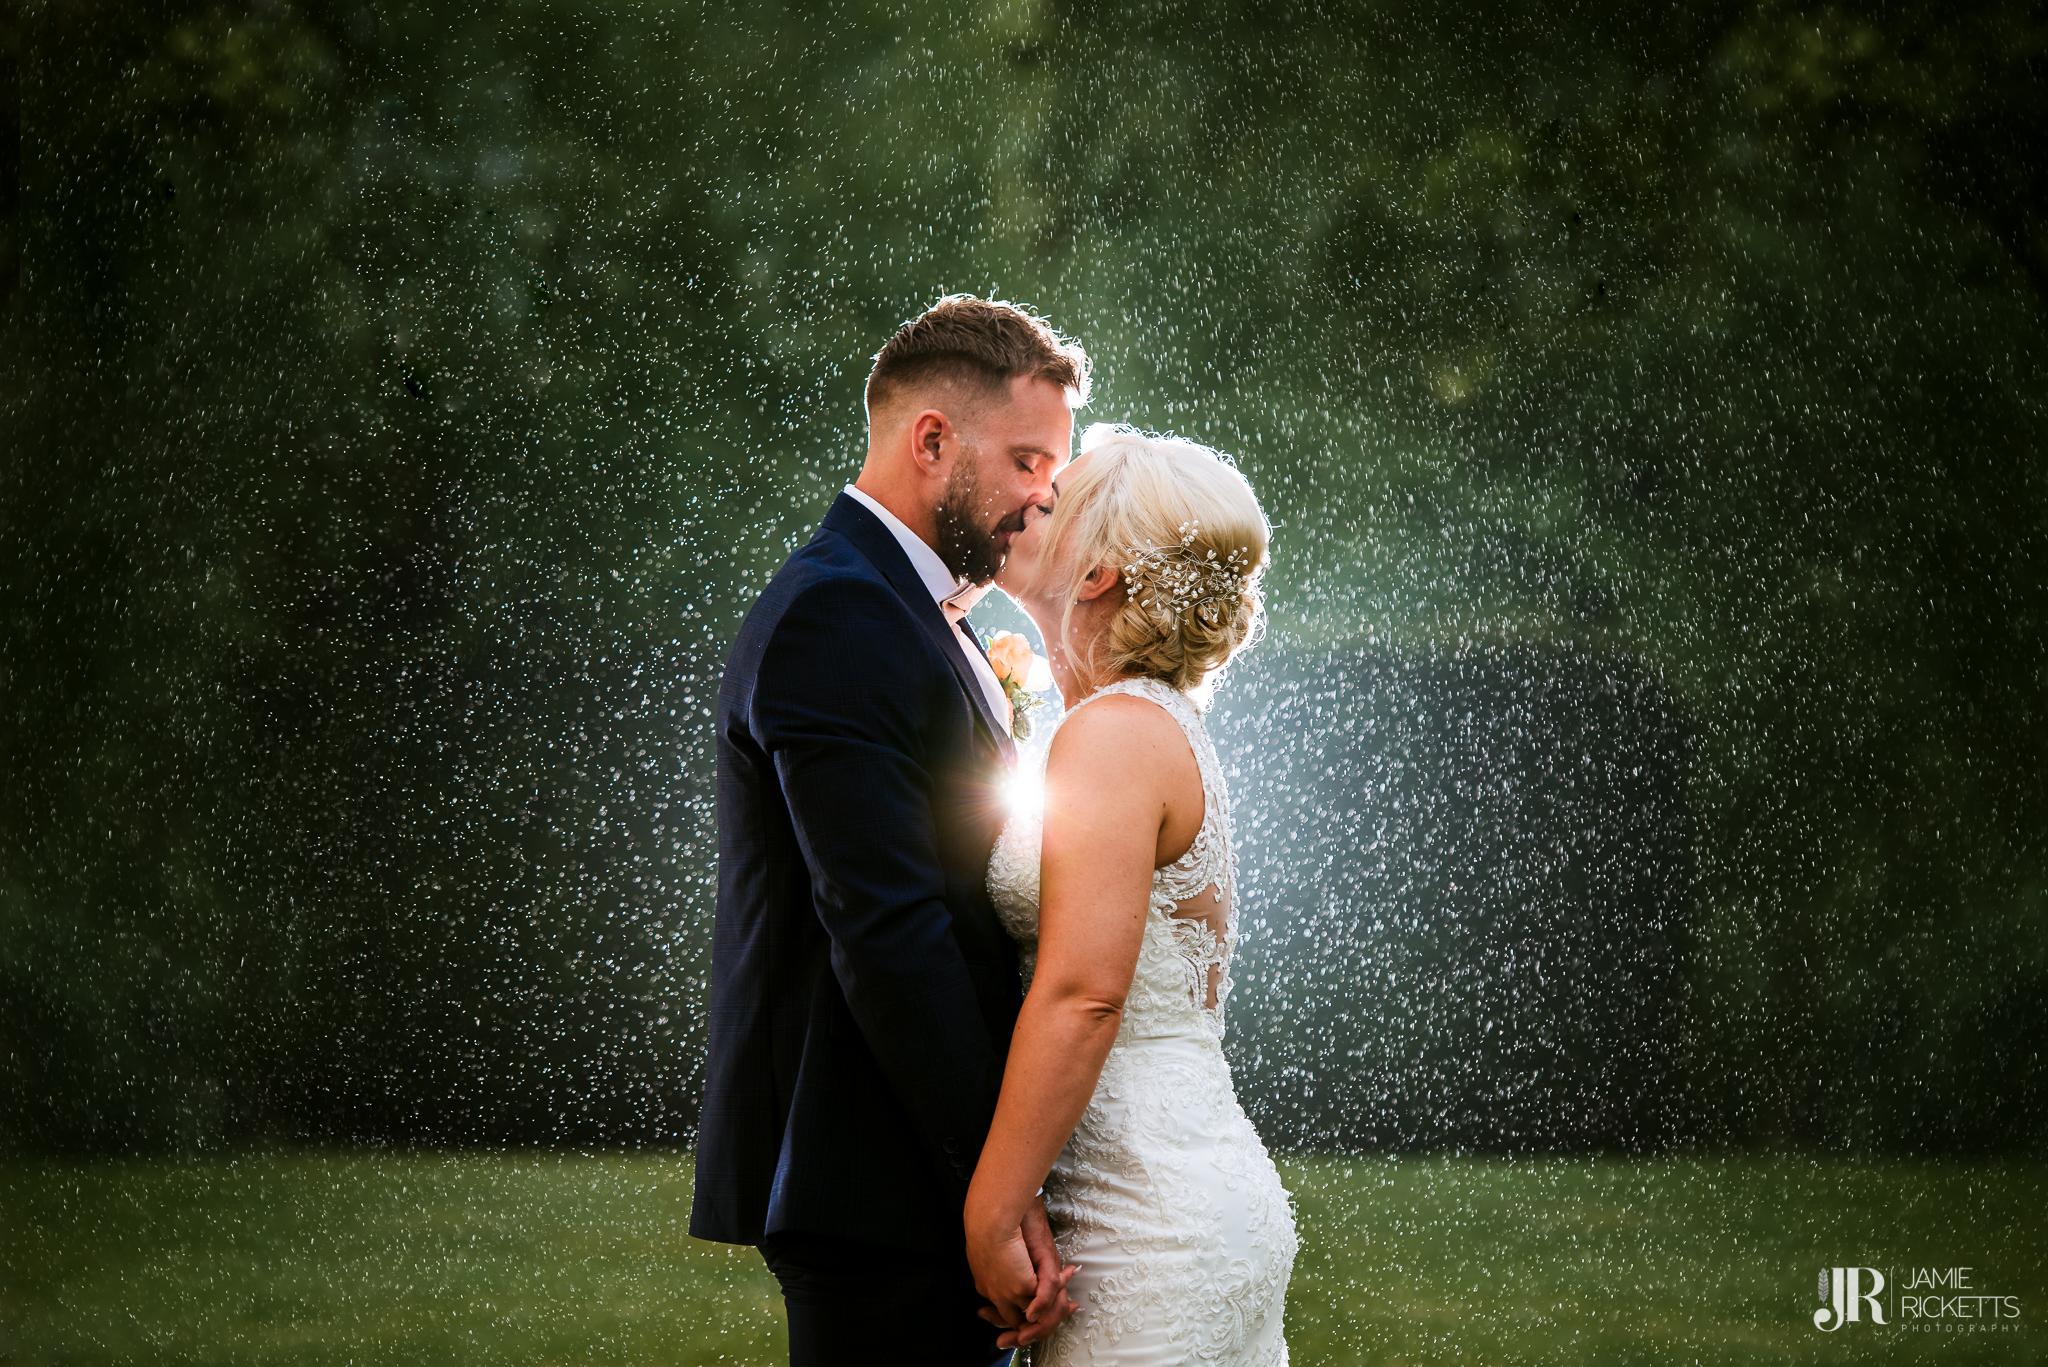 Wedding-Photographer-Shropshire-15.JPG